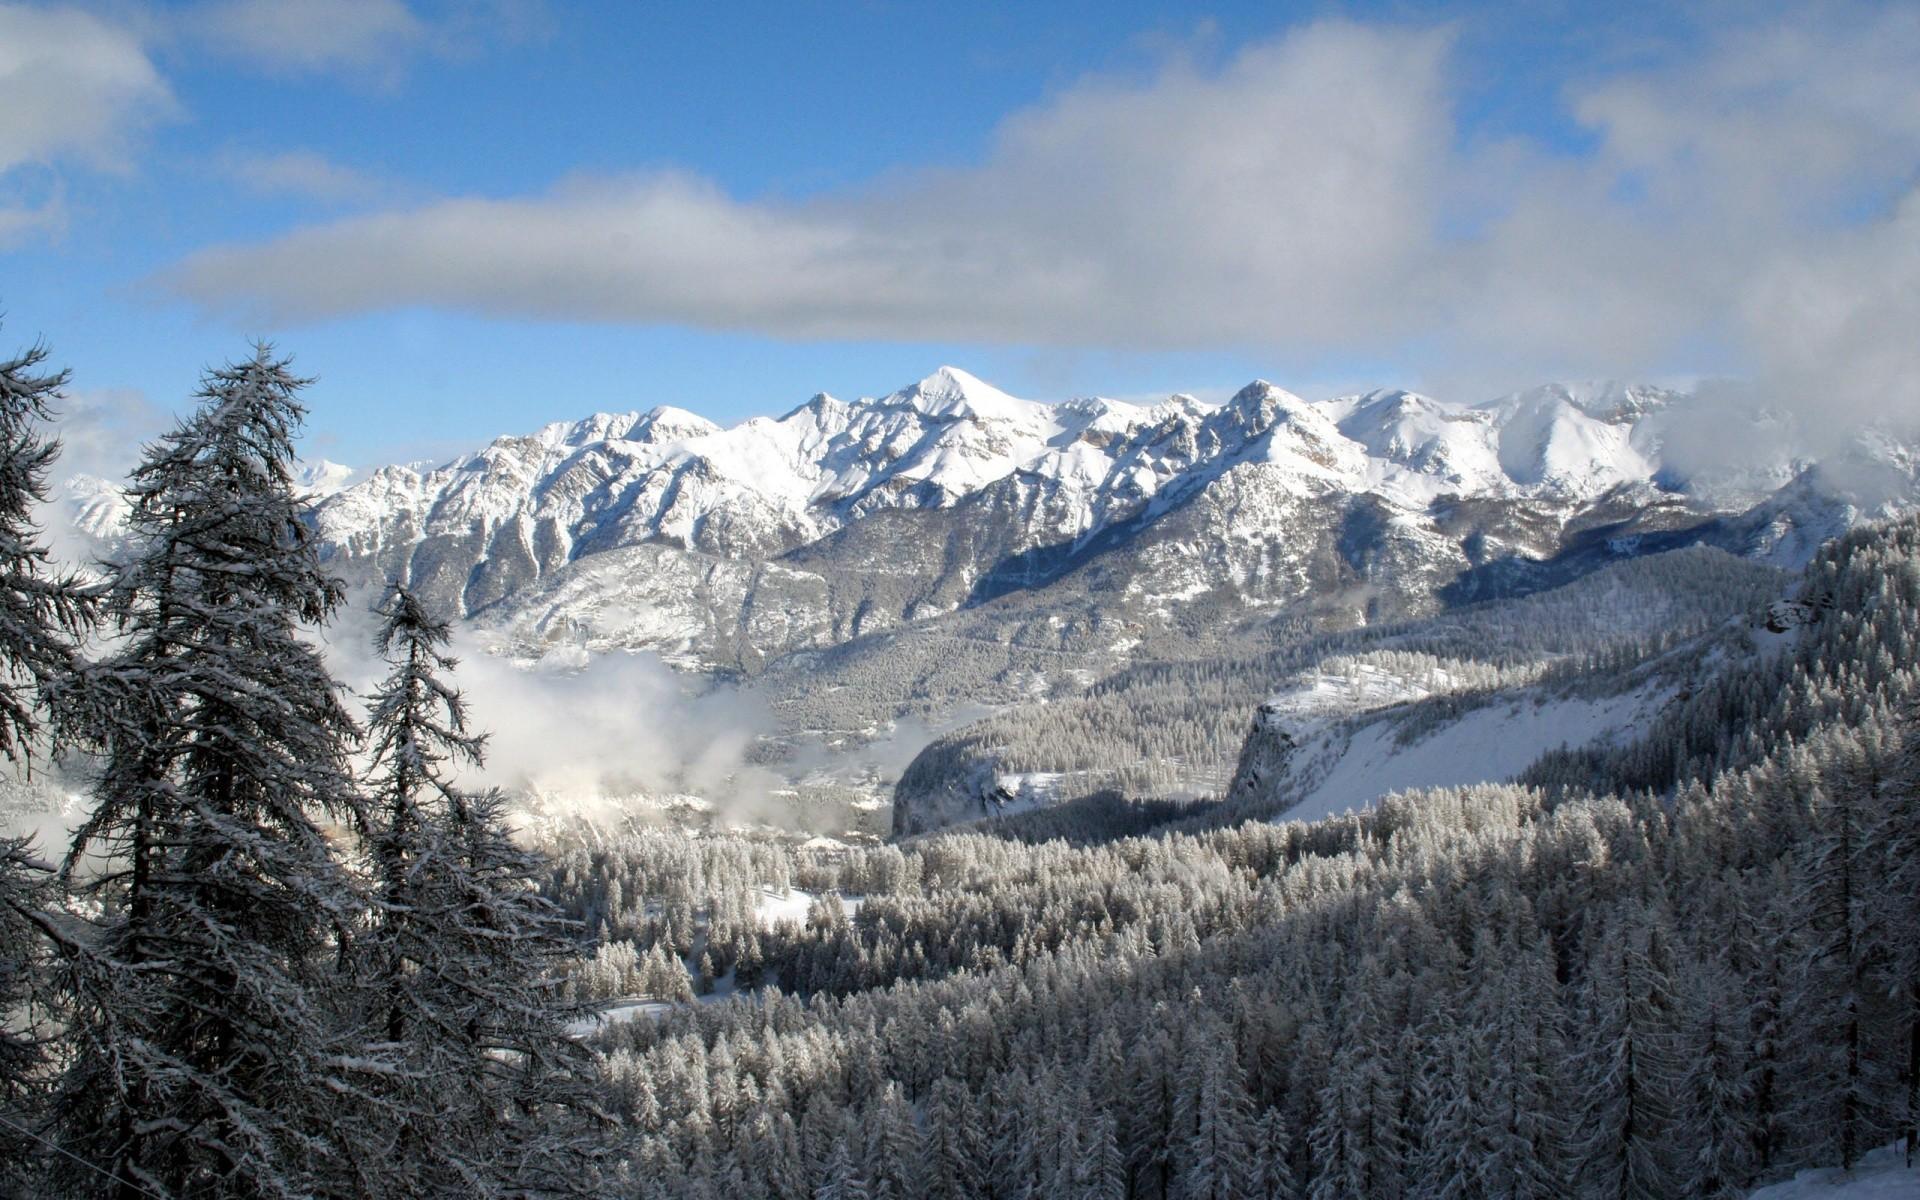 Winter Mountain Wallpaper 29605